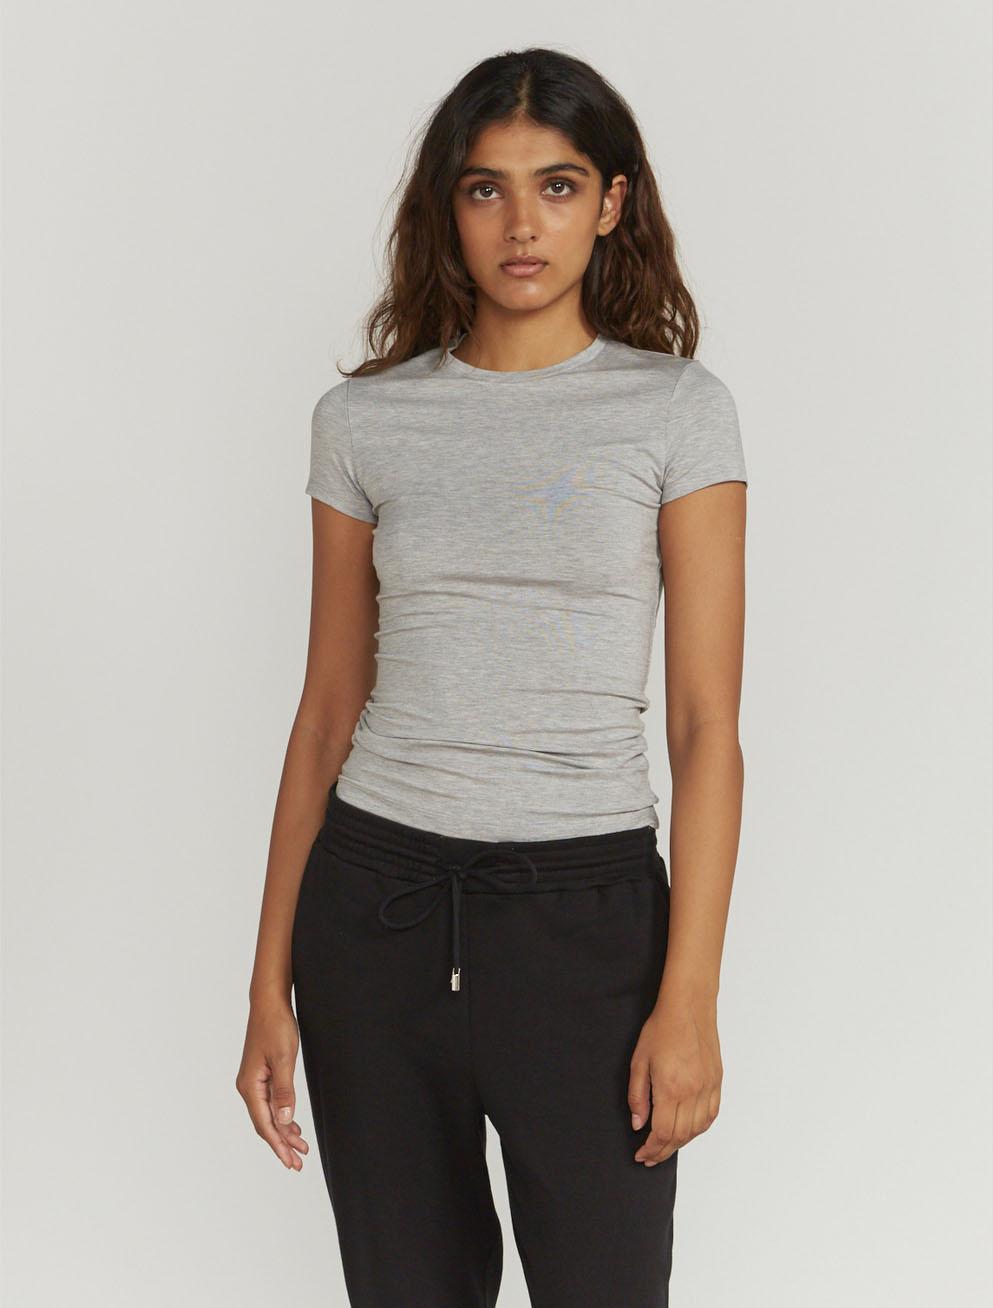 The Jennifer Bodycon T-shirt